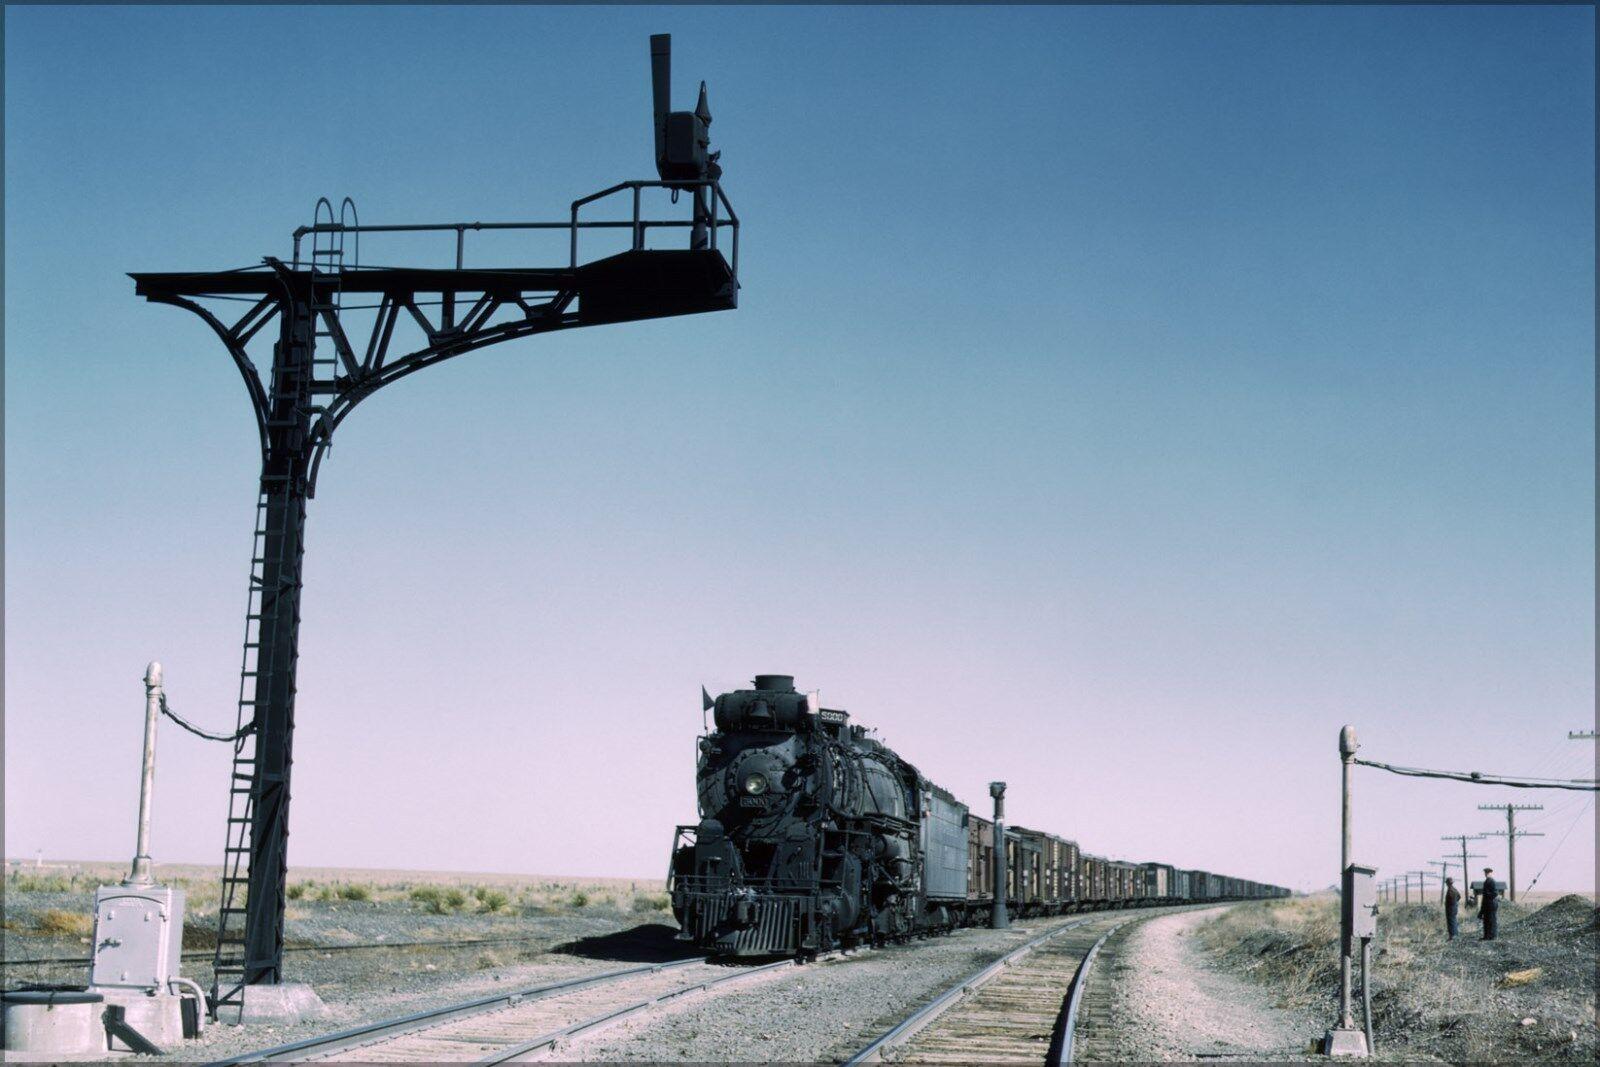 Poster, Many Größes; Santa Fe Railroad Freight Train Steam Engine, New Mexico 194